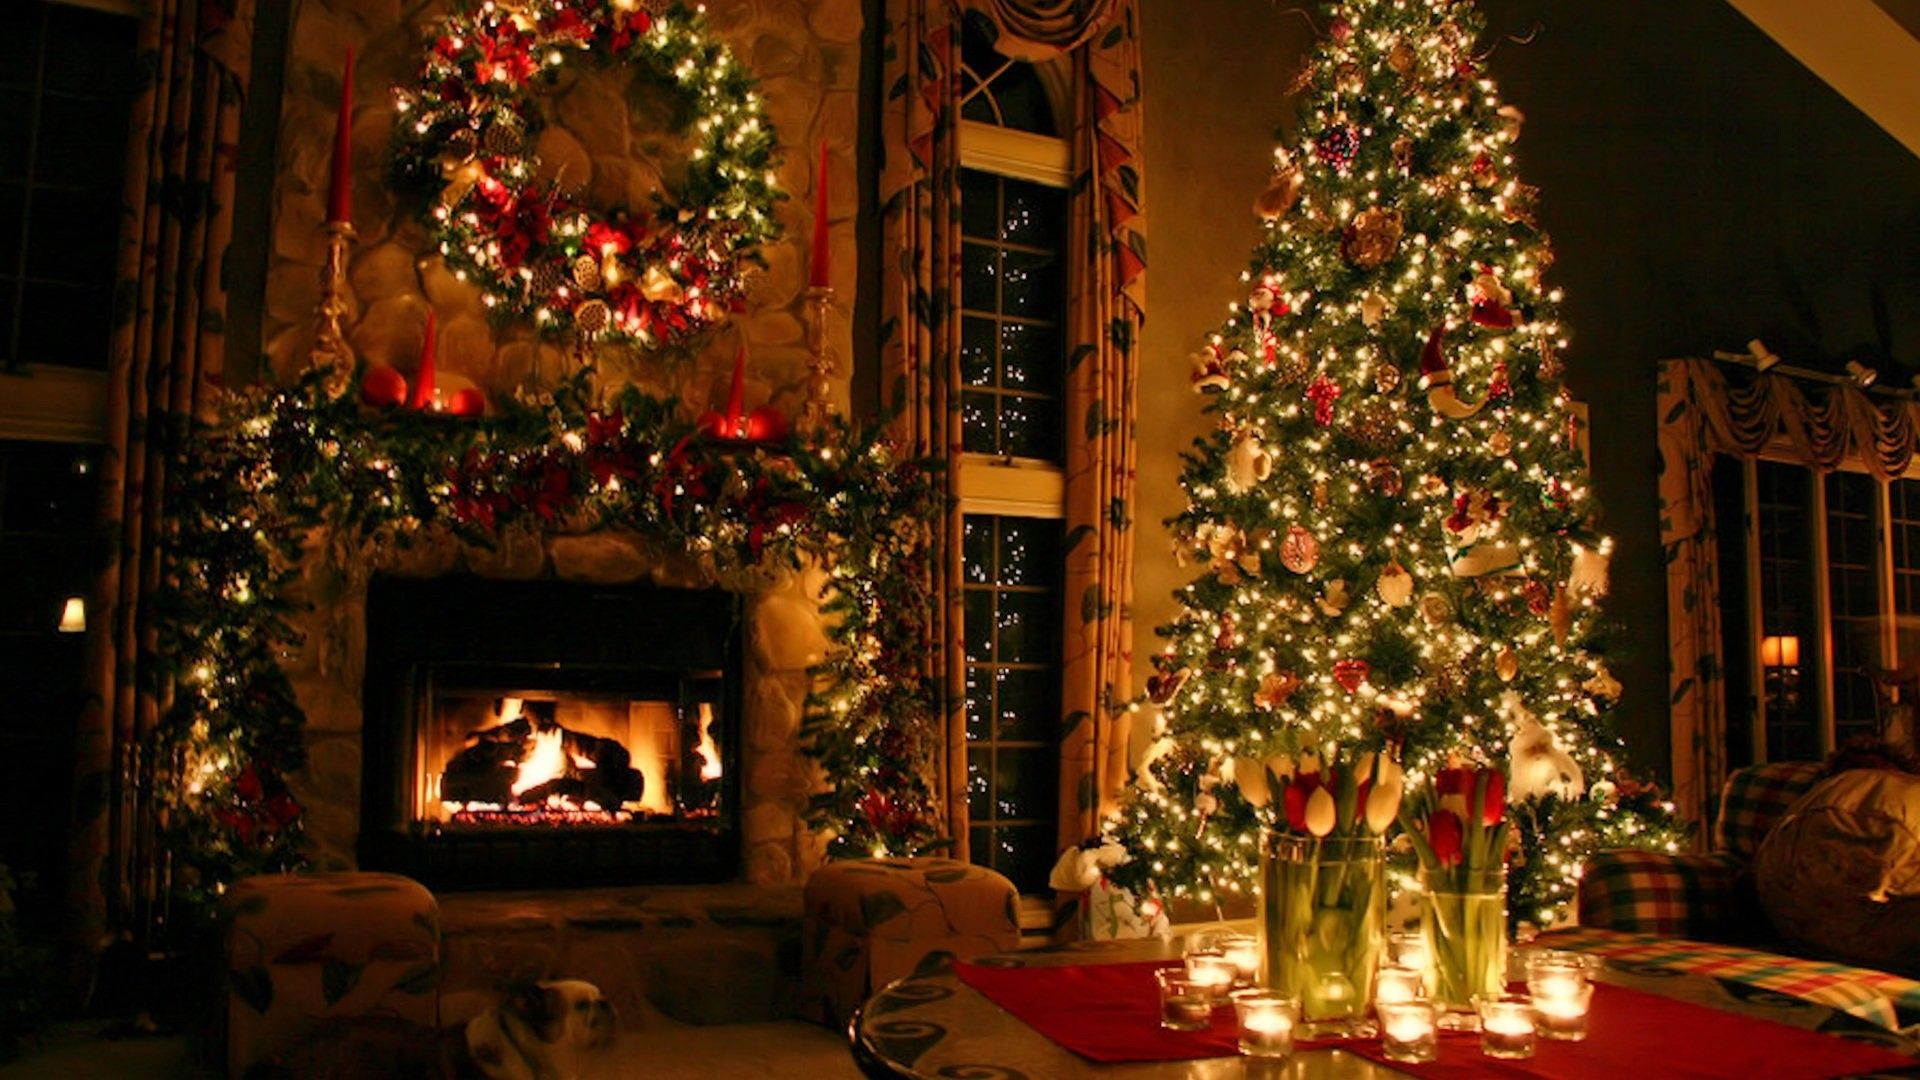 Hd Nativity Desktop Wallpapers Top Free Hd Nativity Desktop Backgrounds Wallpaperaccess